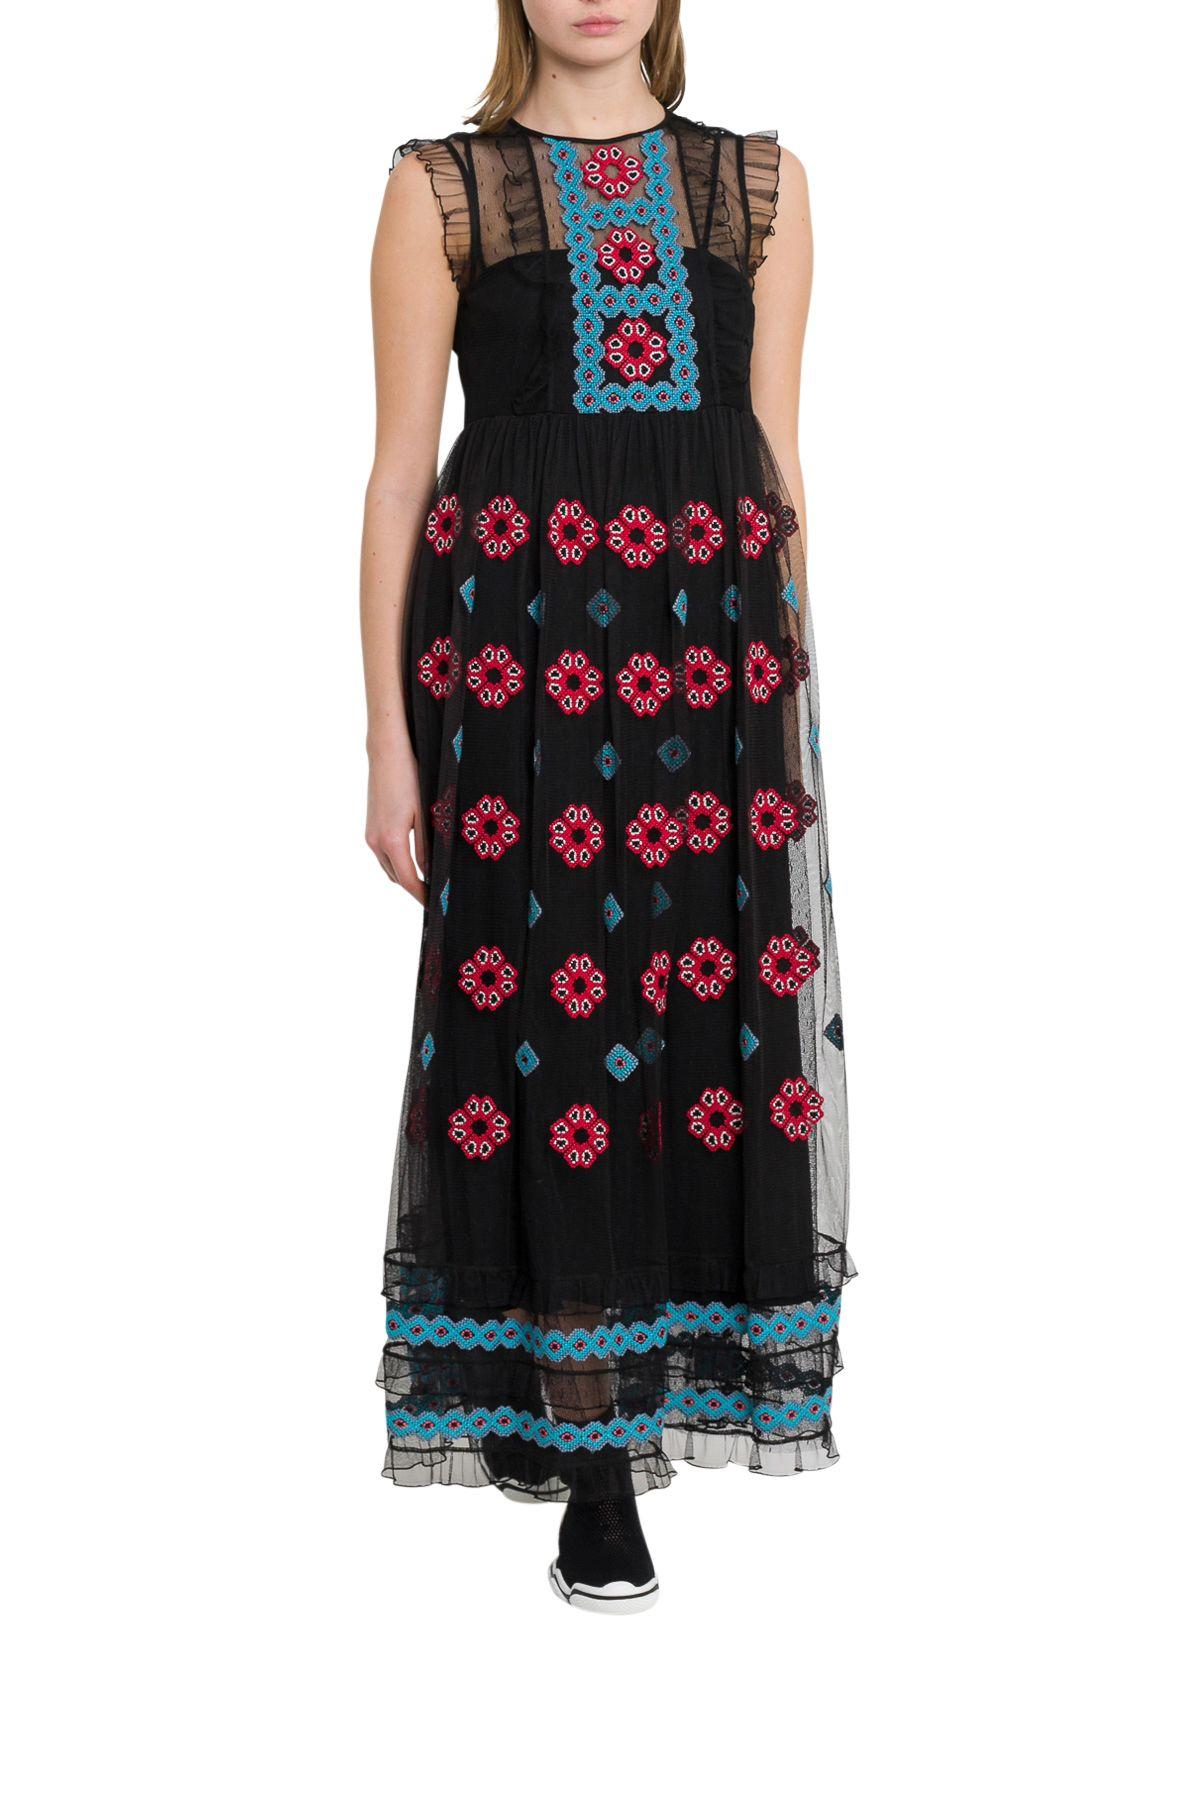 2ad539da608 Red Valentino Embroidered Maxi Dress With Ruffles In Black